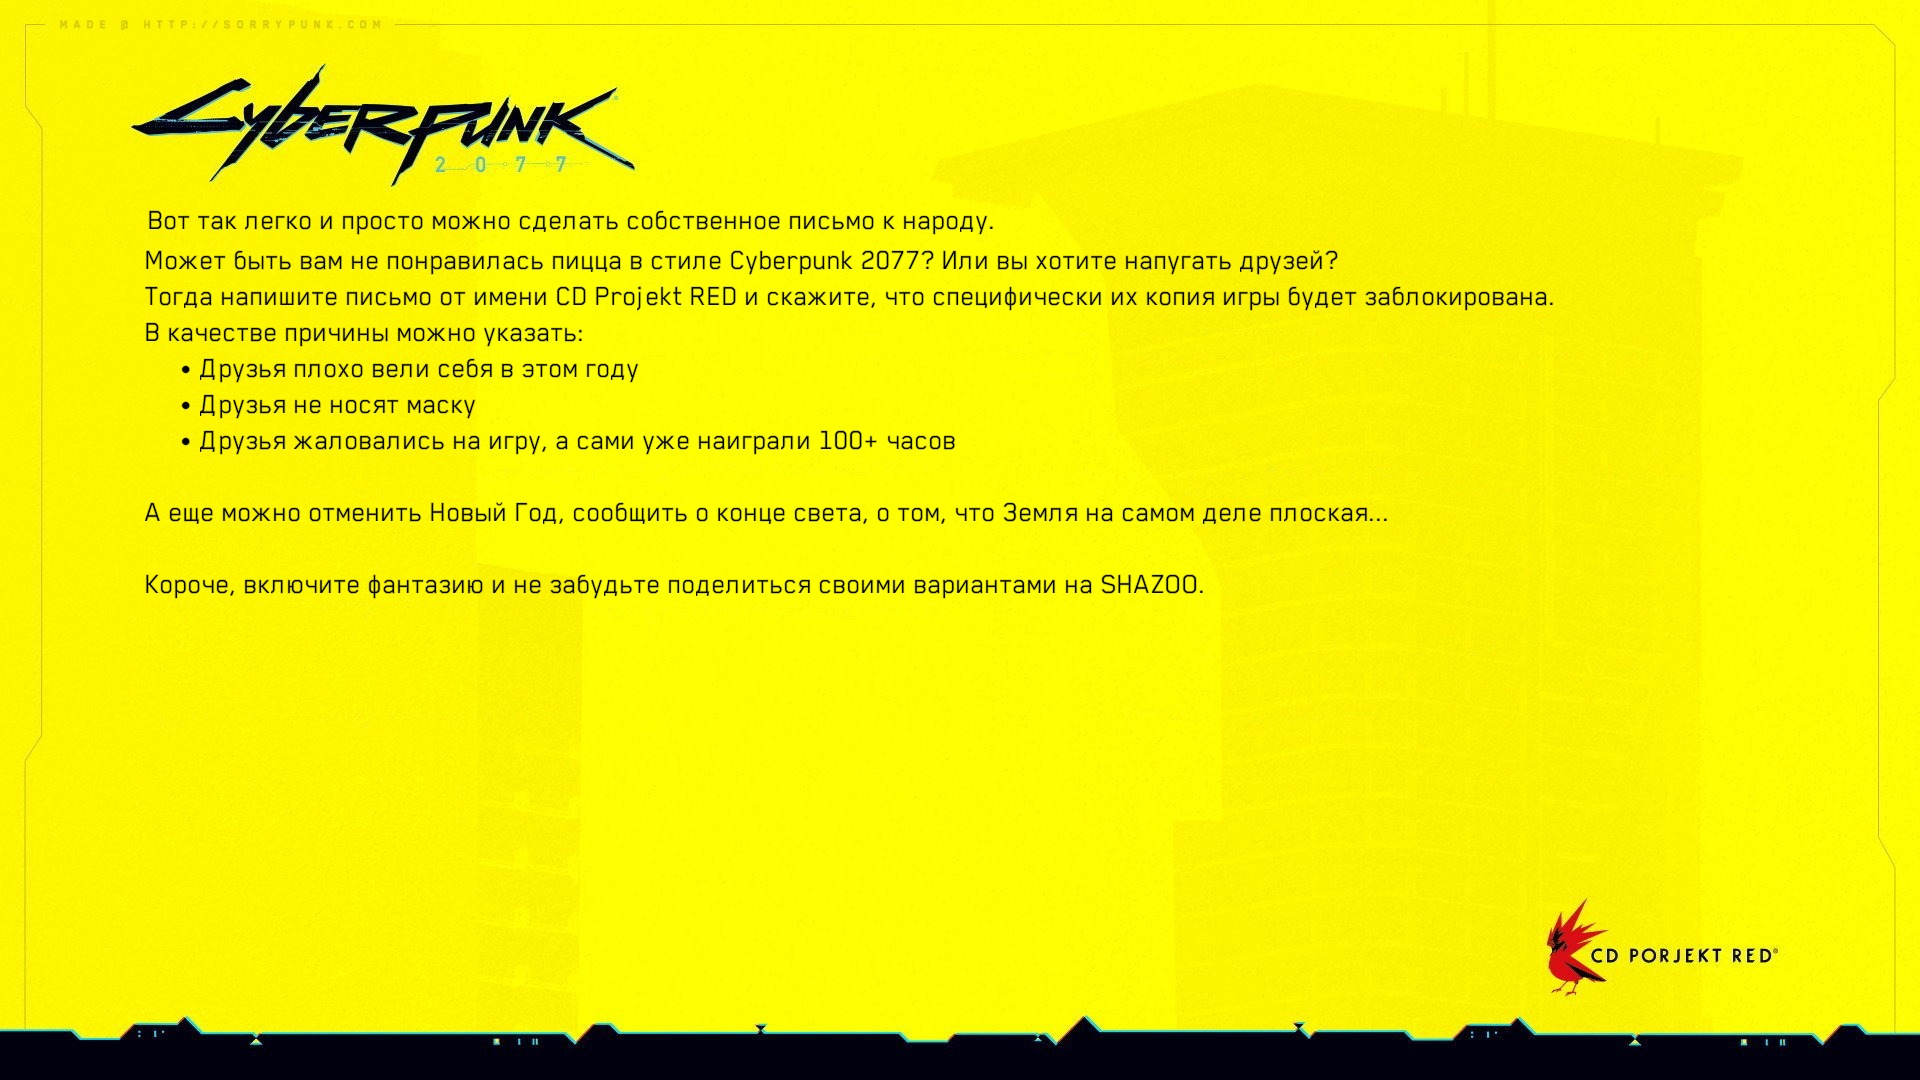 Умелец написал генератор извинений в стиле Cyberpunk 2077